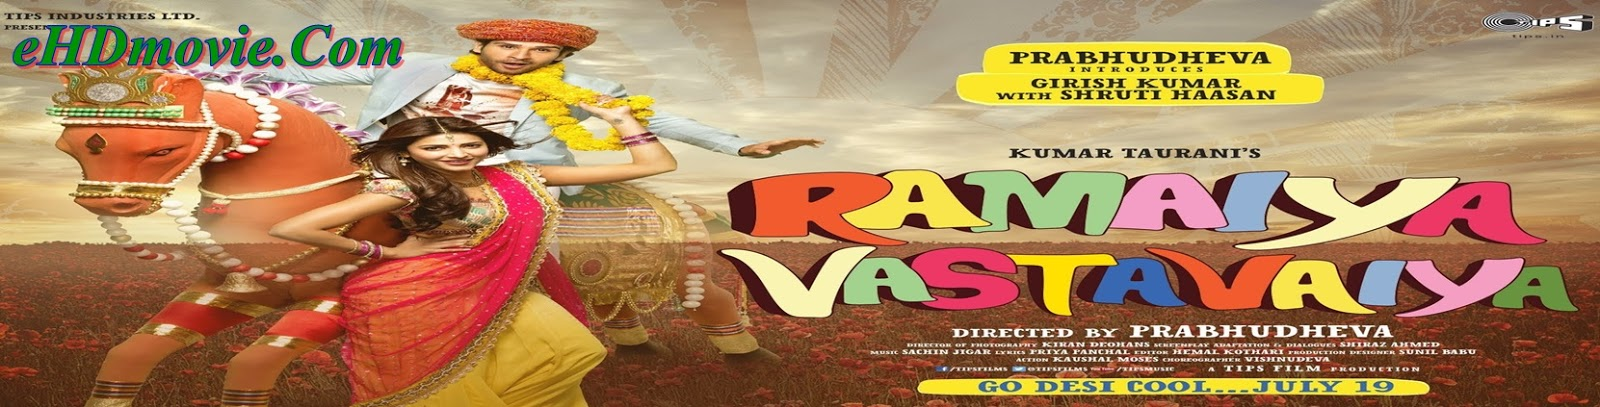 Ramaiya Vastavaiya 2013 Full Movie Hindi 720p - 480p ORG BRRip 400MB - 750MB ESubs Free Download